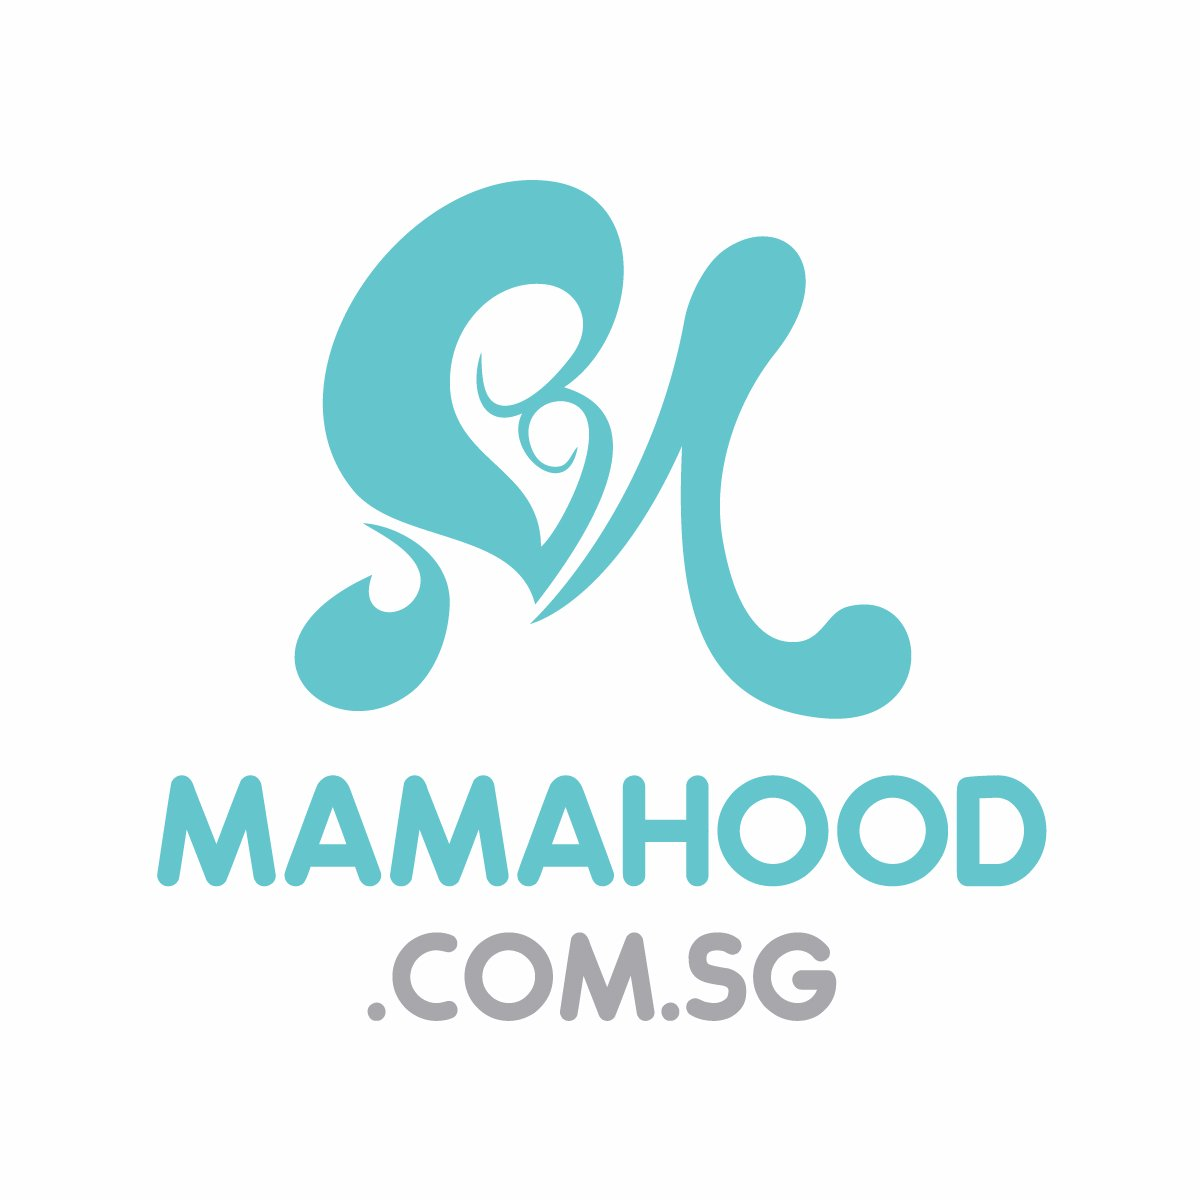 @Mamahoodcomsg